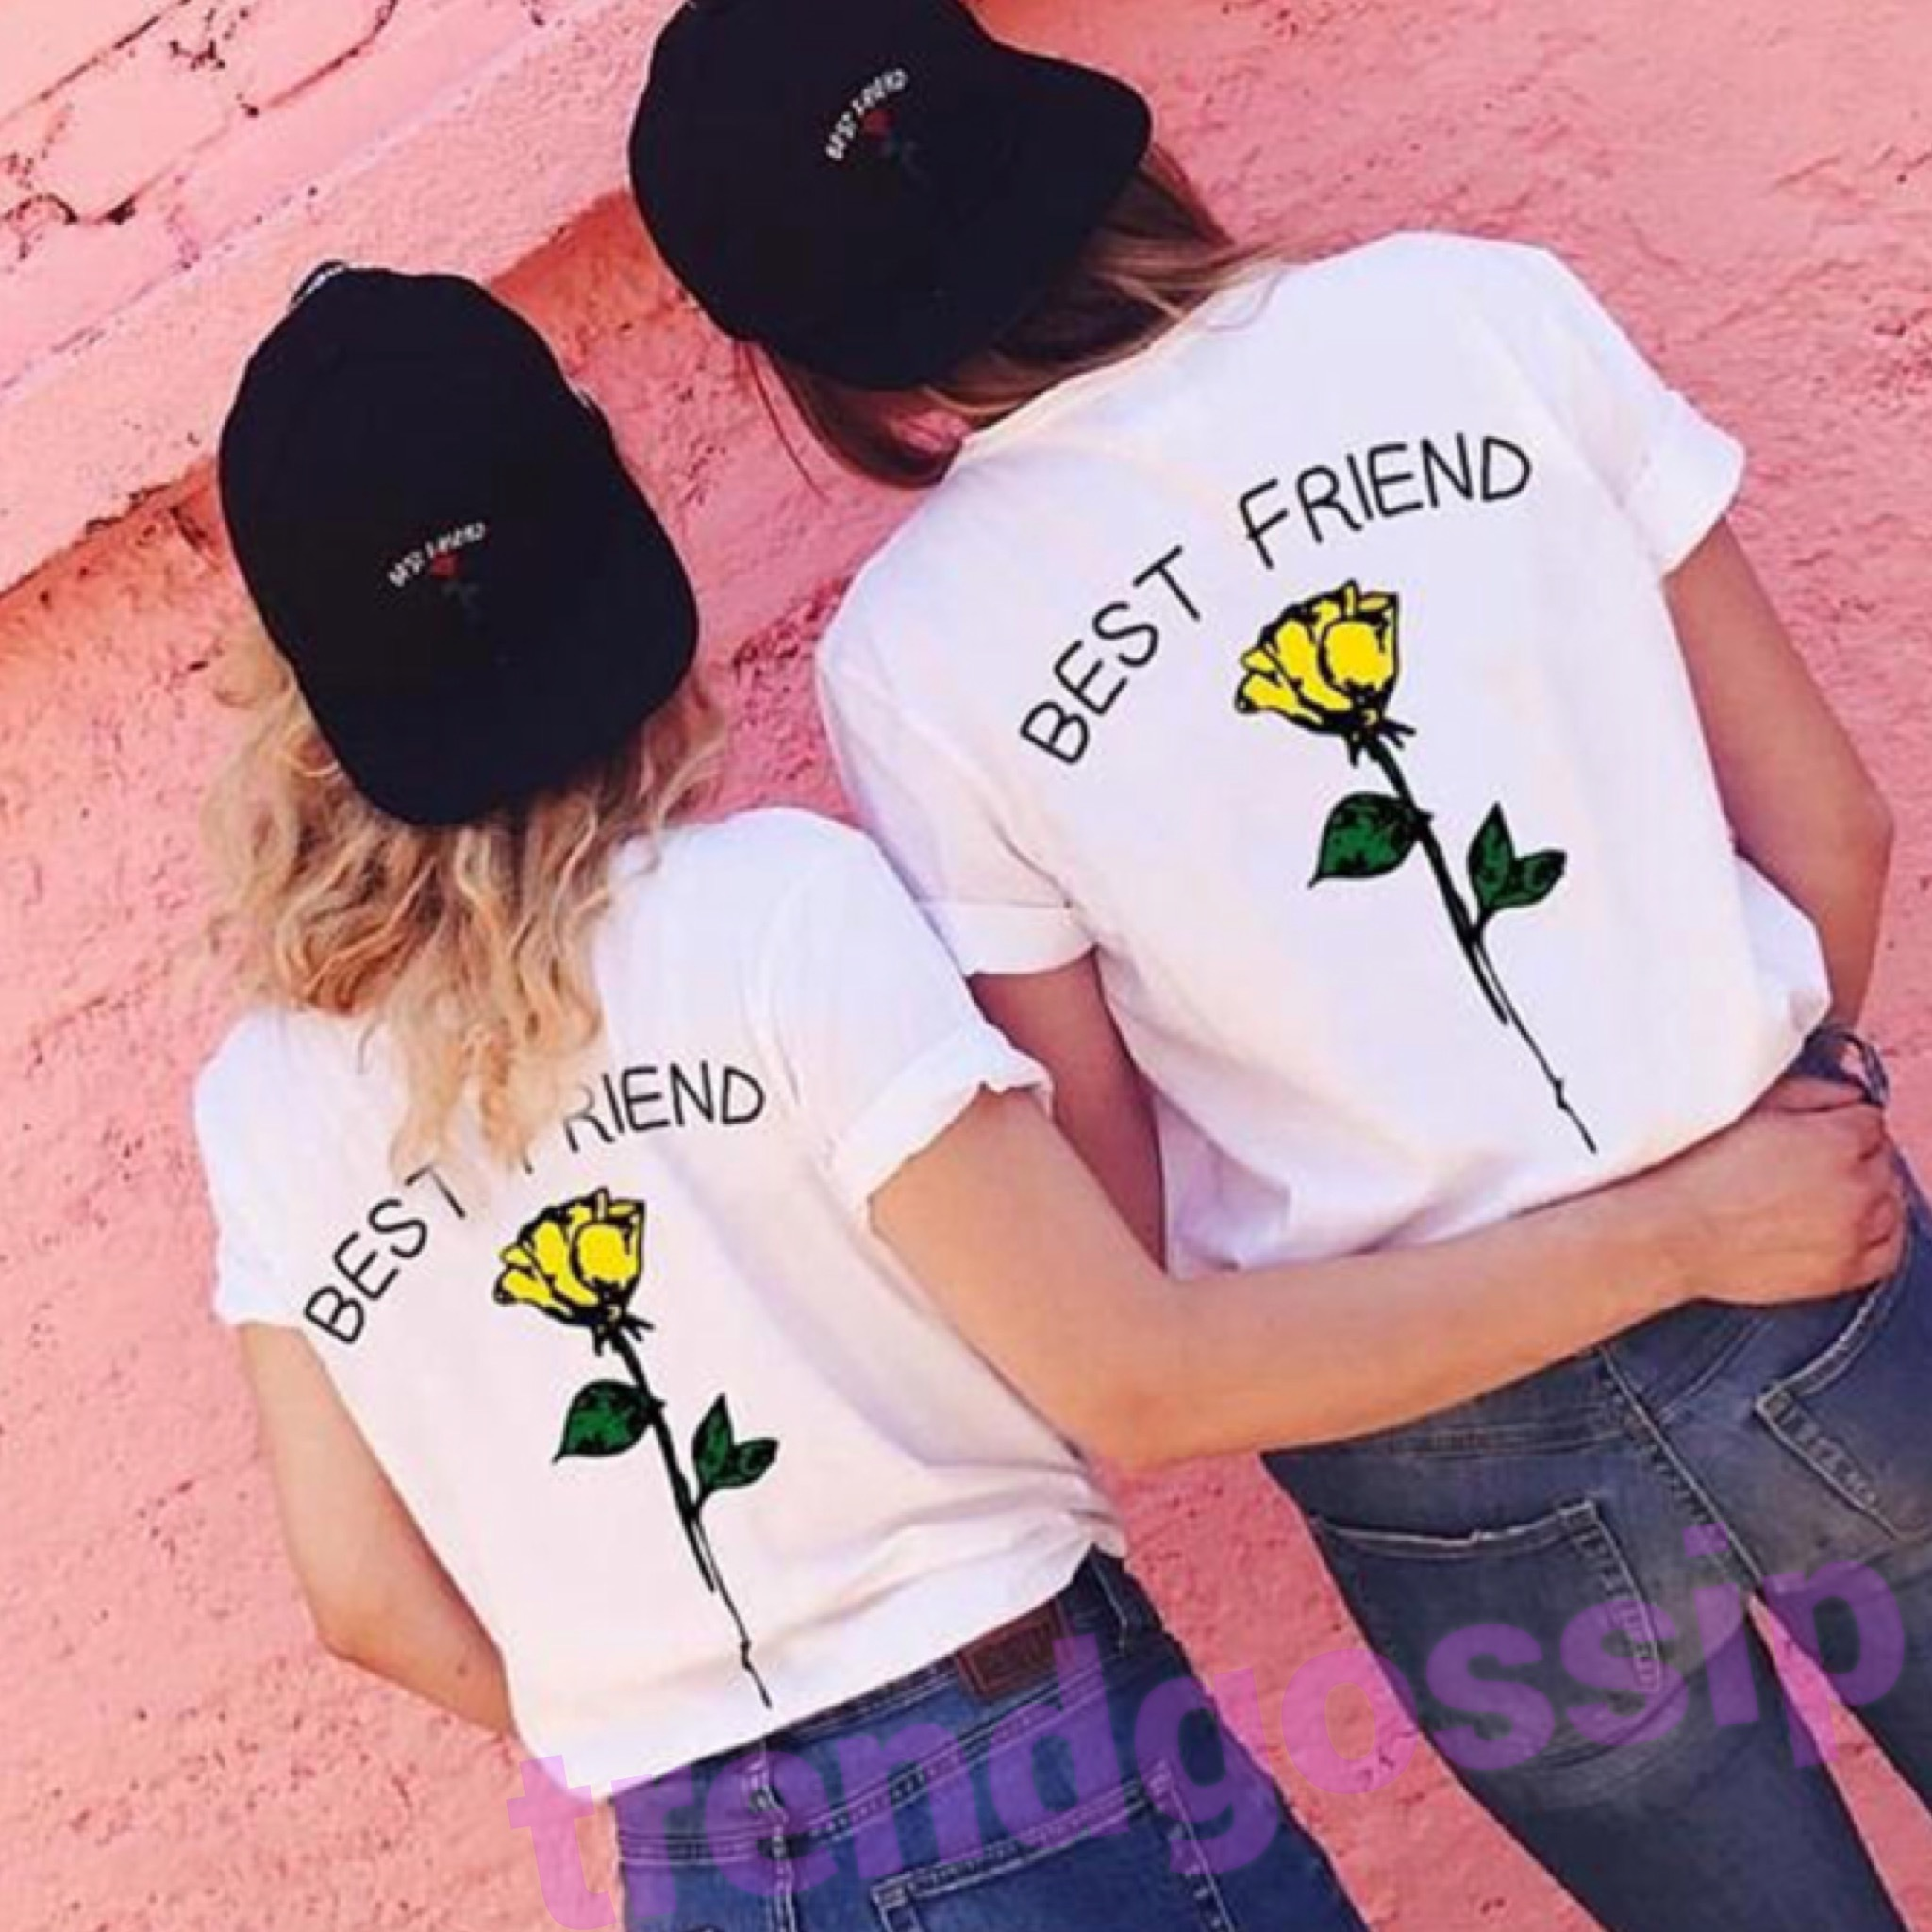 BestFriendローズTシャツ/お揃いTシャツ/3色展開/S〜XXL